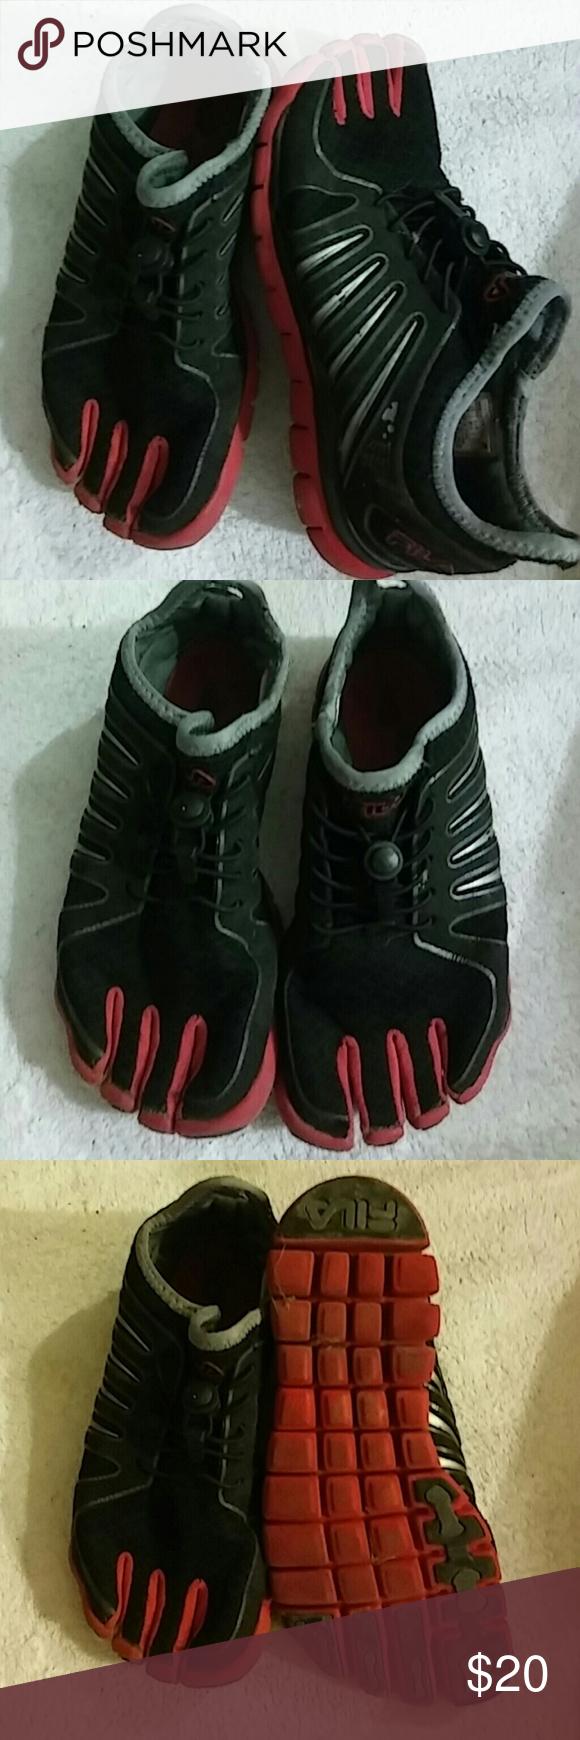 Fila Toe Shoes Sz 3.5 M Girls Preowned Fila Shoes Sneakers